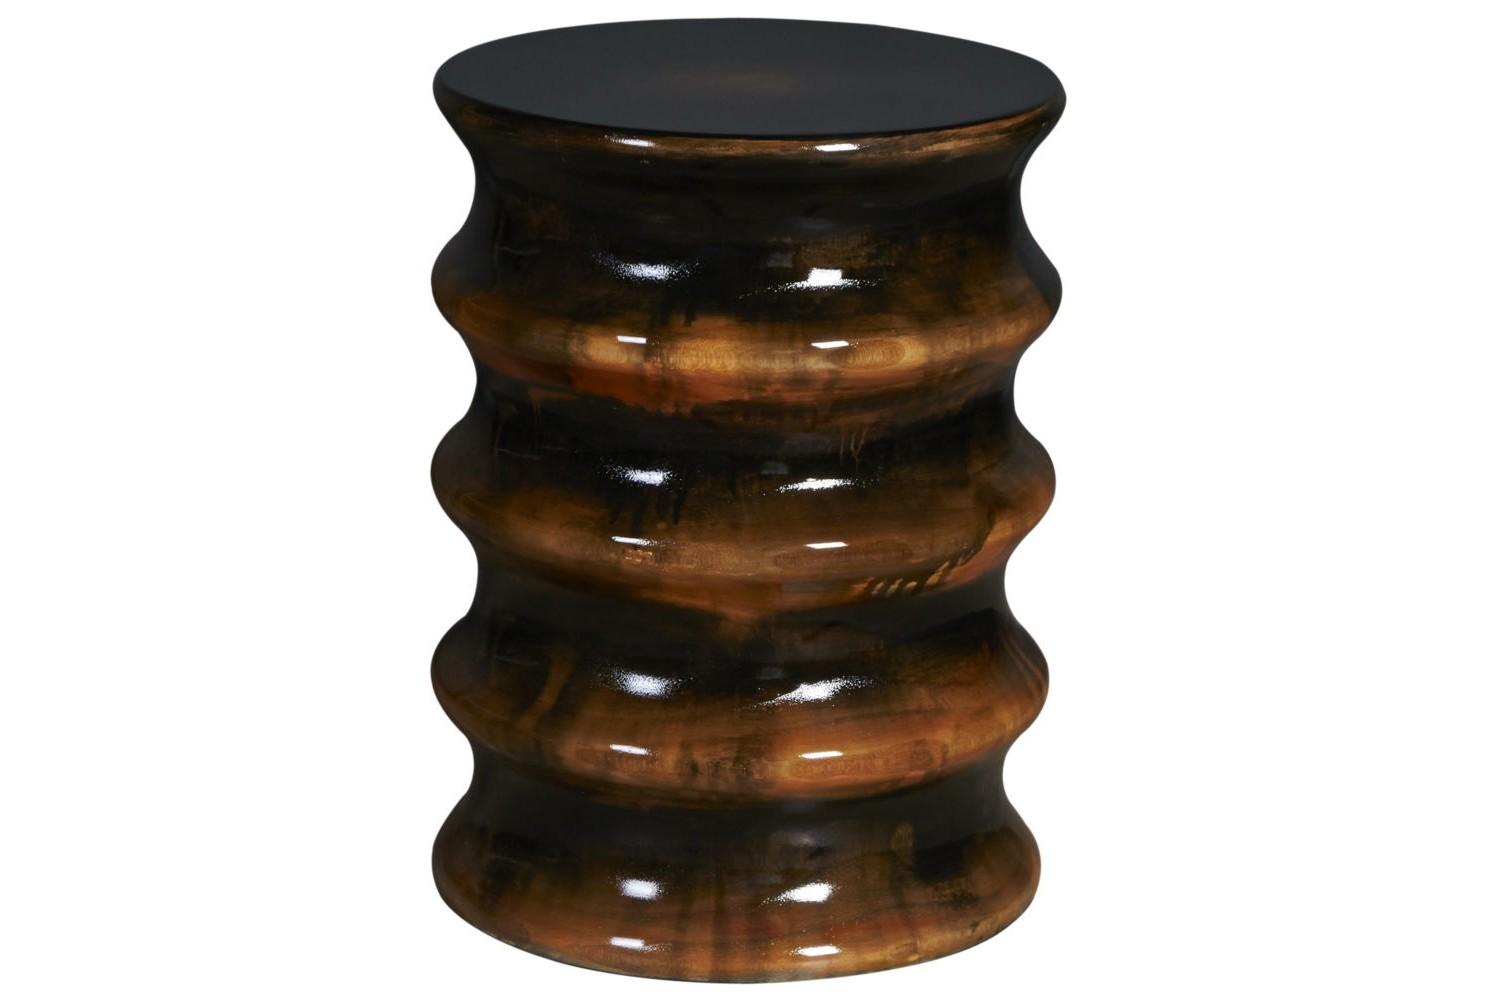 ТабуретТабуреты<br><br><br>Material: Дерево<br>Width см: None<br>Depth см: None<br>Height см: 45<br>Diameter см: 34